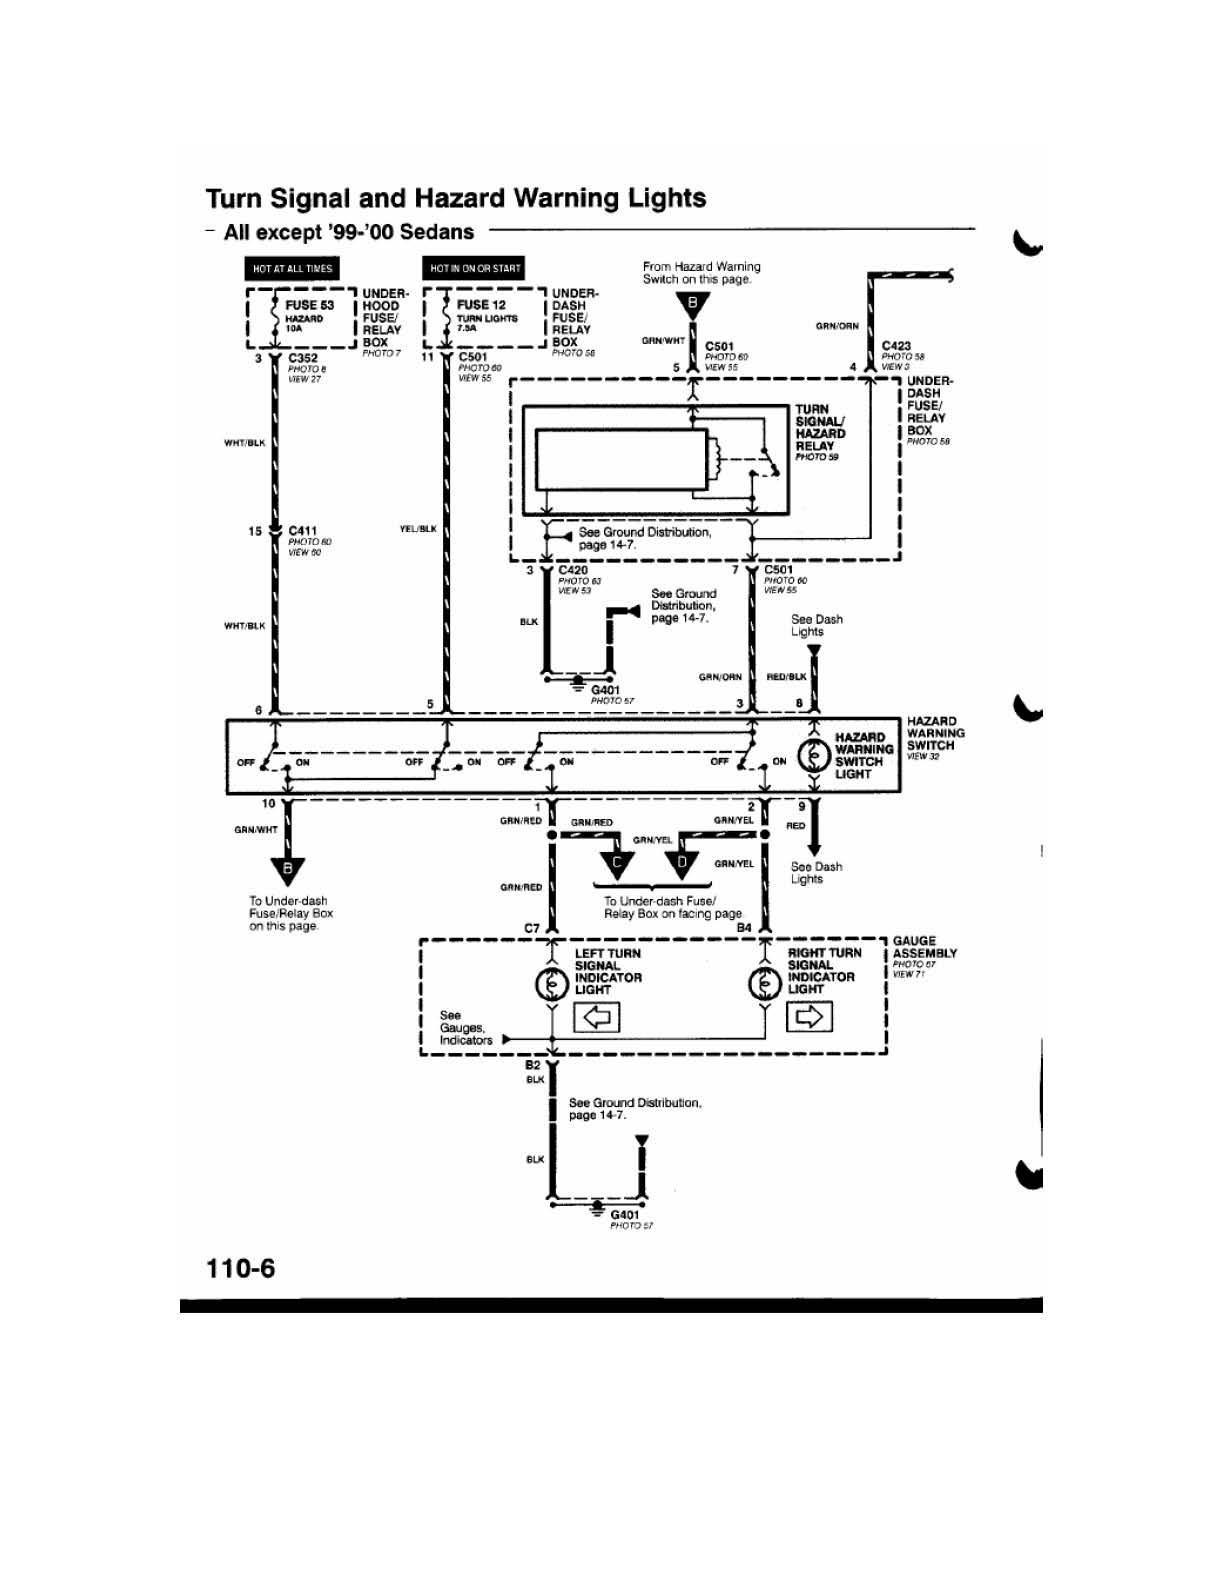 Honda Ac Wiring Diagram New Honda Ac Wiring Diagram Save Turn Signal Wiring Diagram Turn Signal